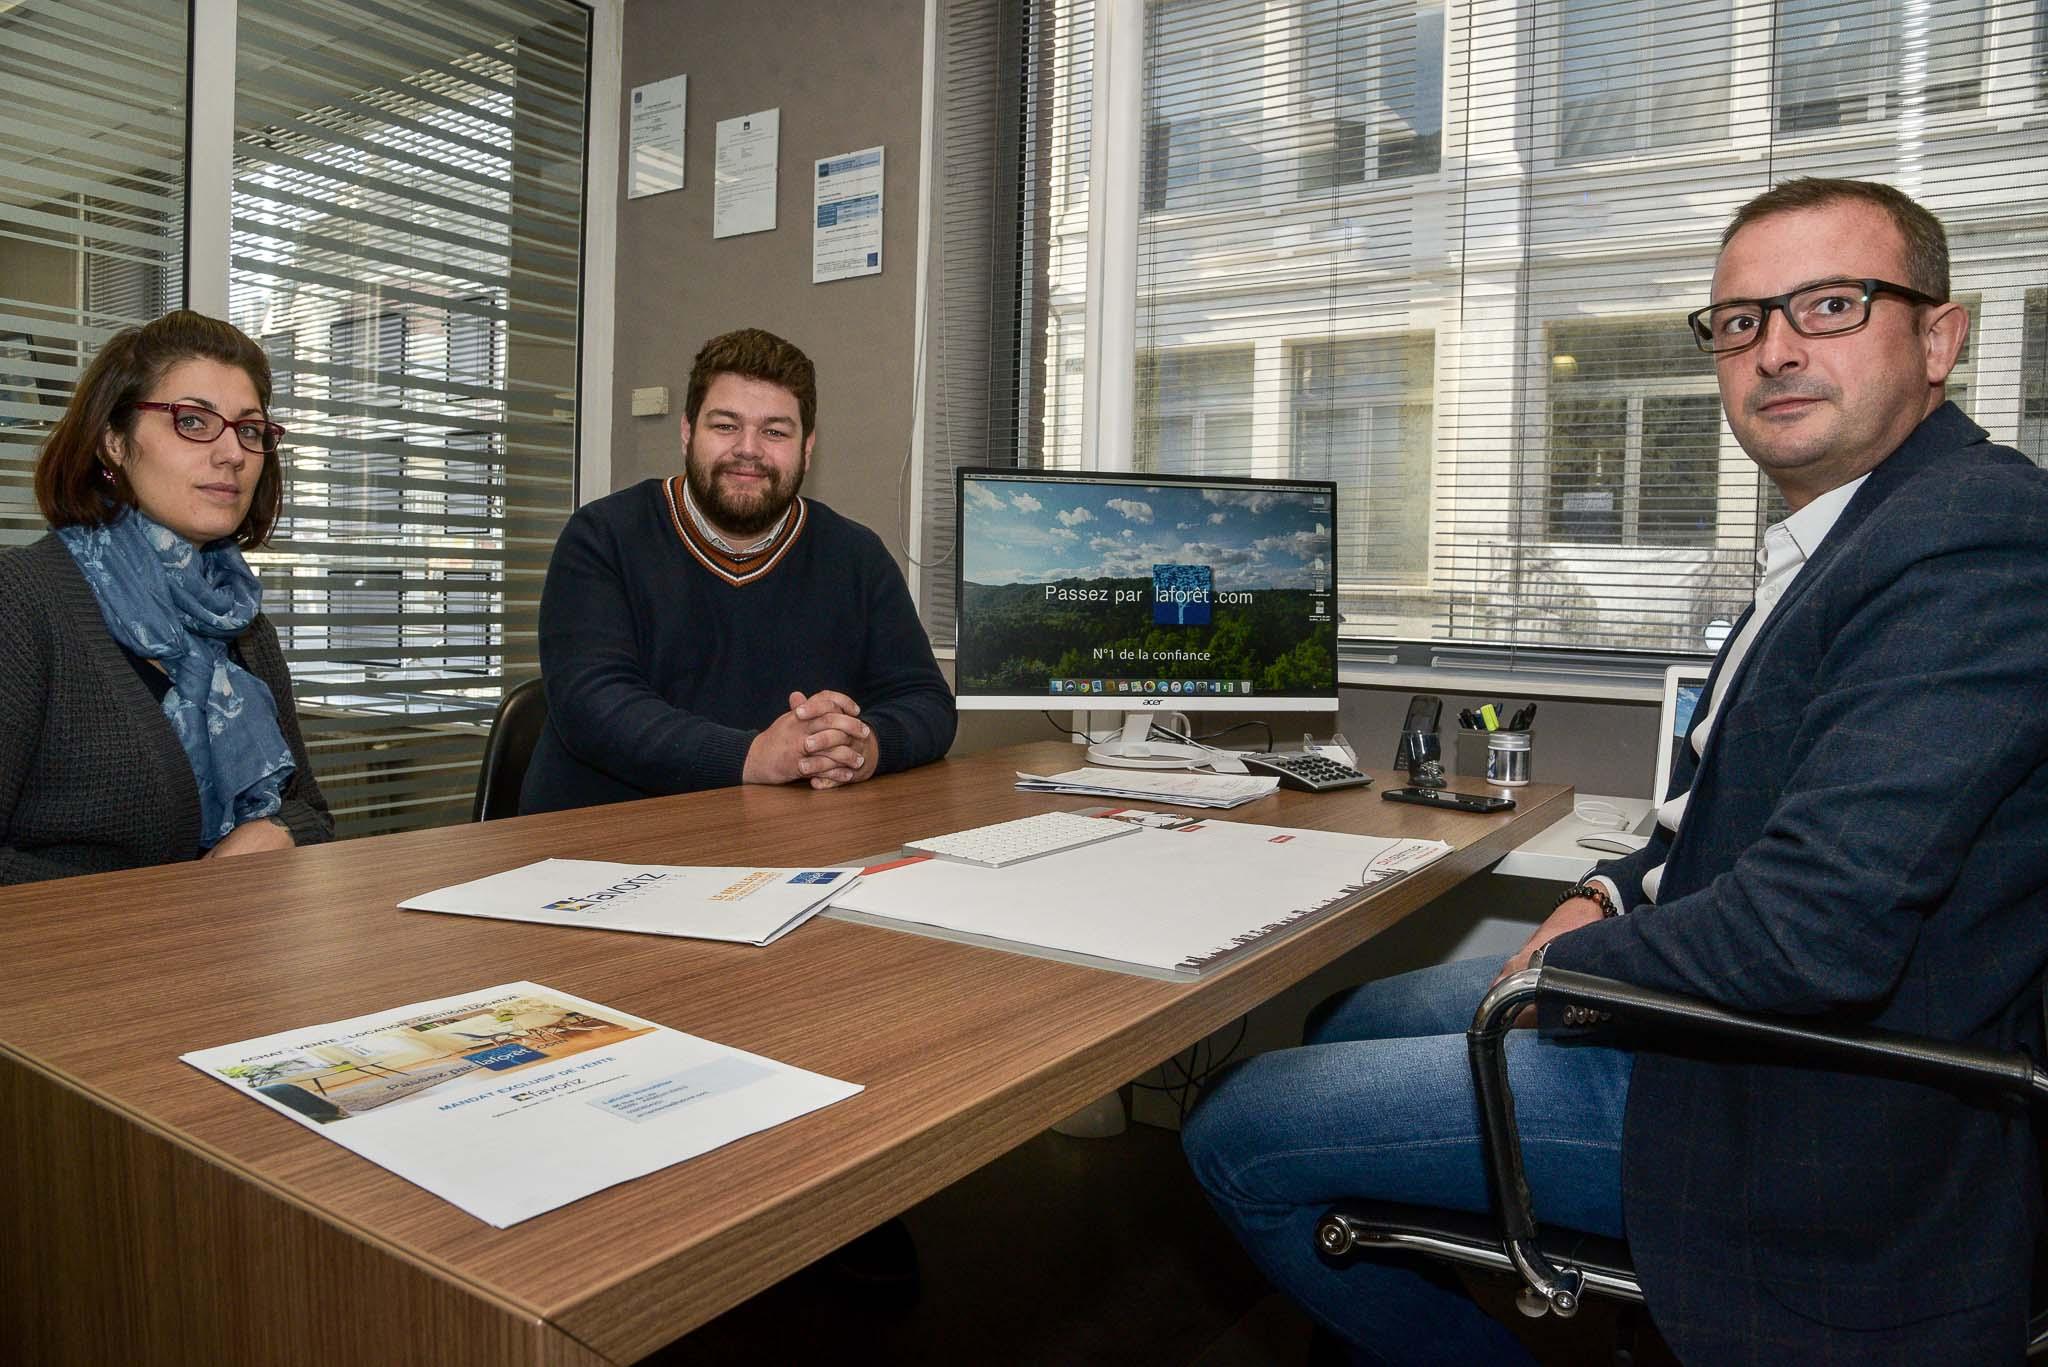 fb-Agence-Laforet-50ansPhotoClub-019